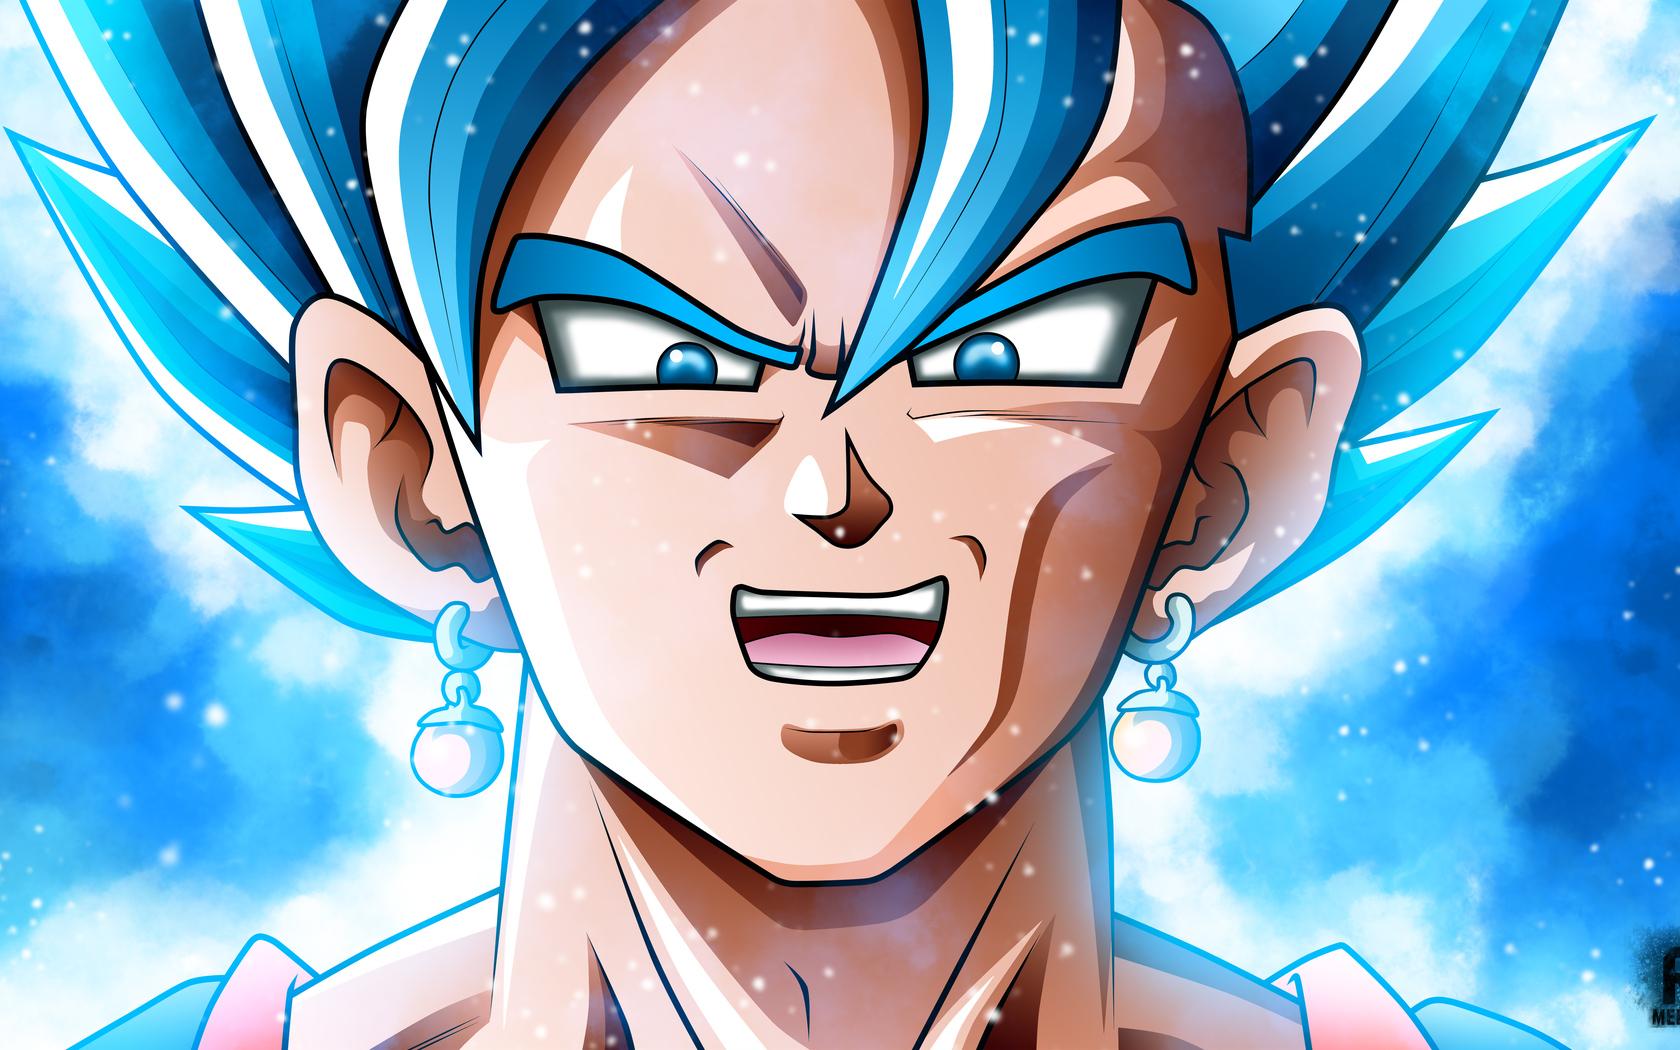 dragon-ball-super-saiyajin-blue-5k-nq.jpg